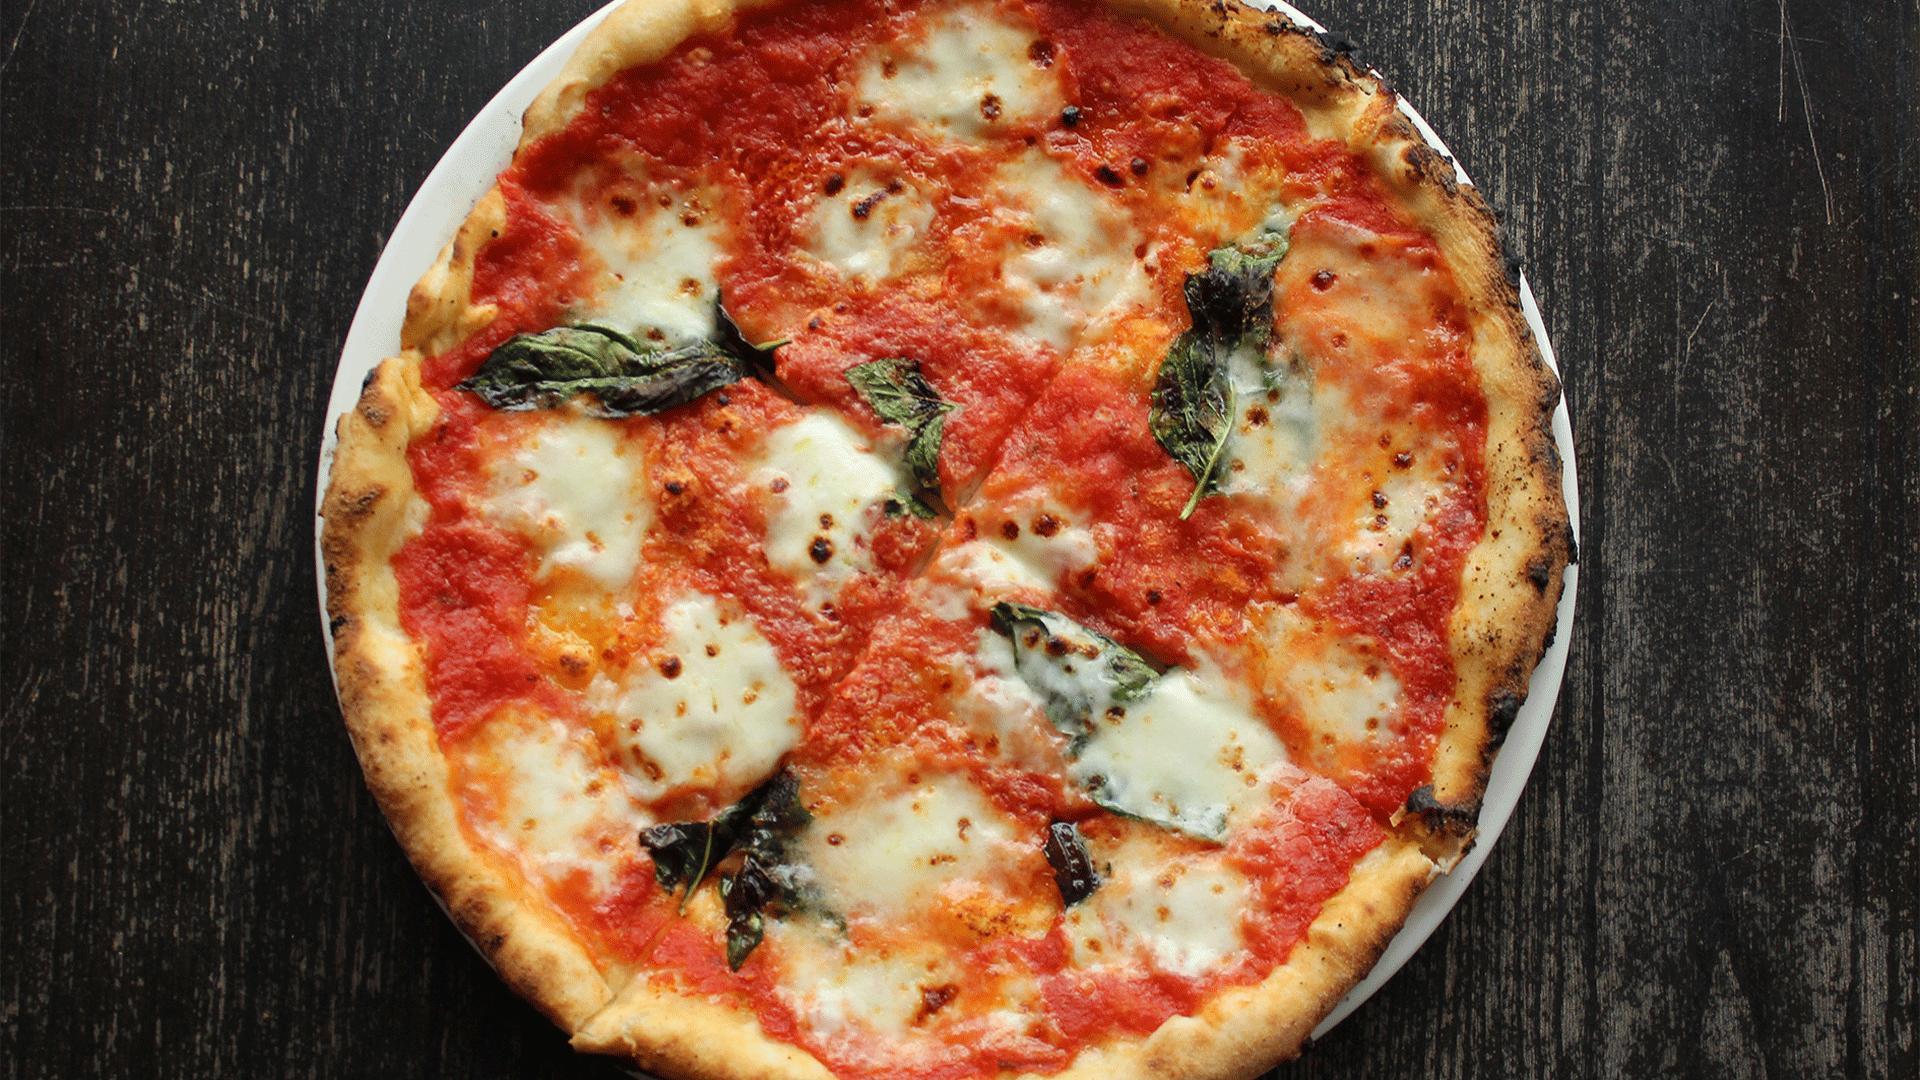 The best pizza in Toronto | A Margherita pizza at Pizzeria Libretto